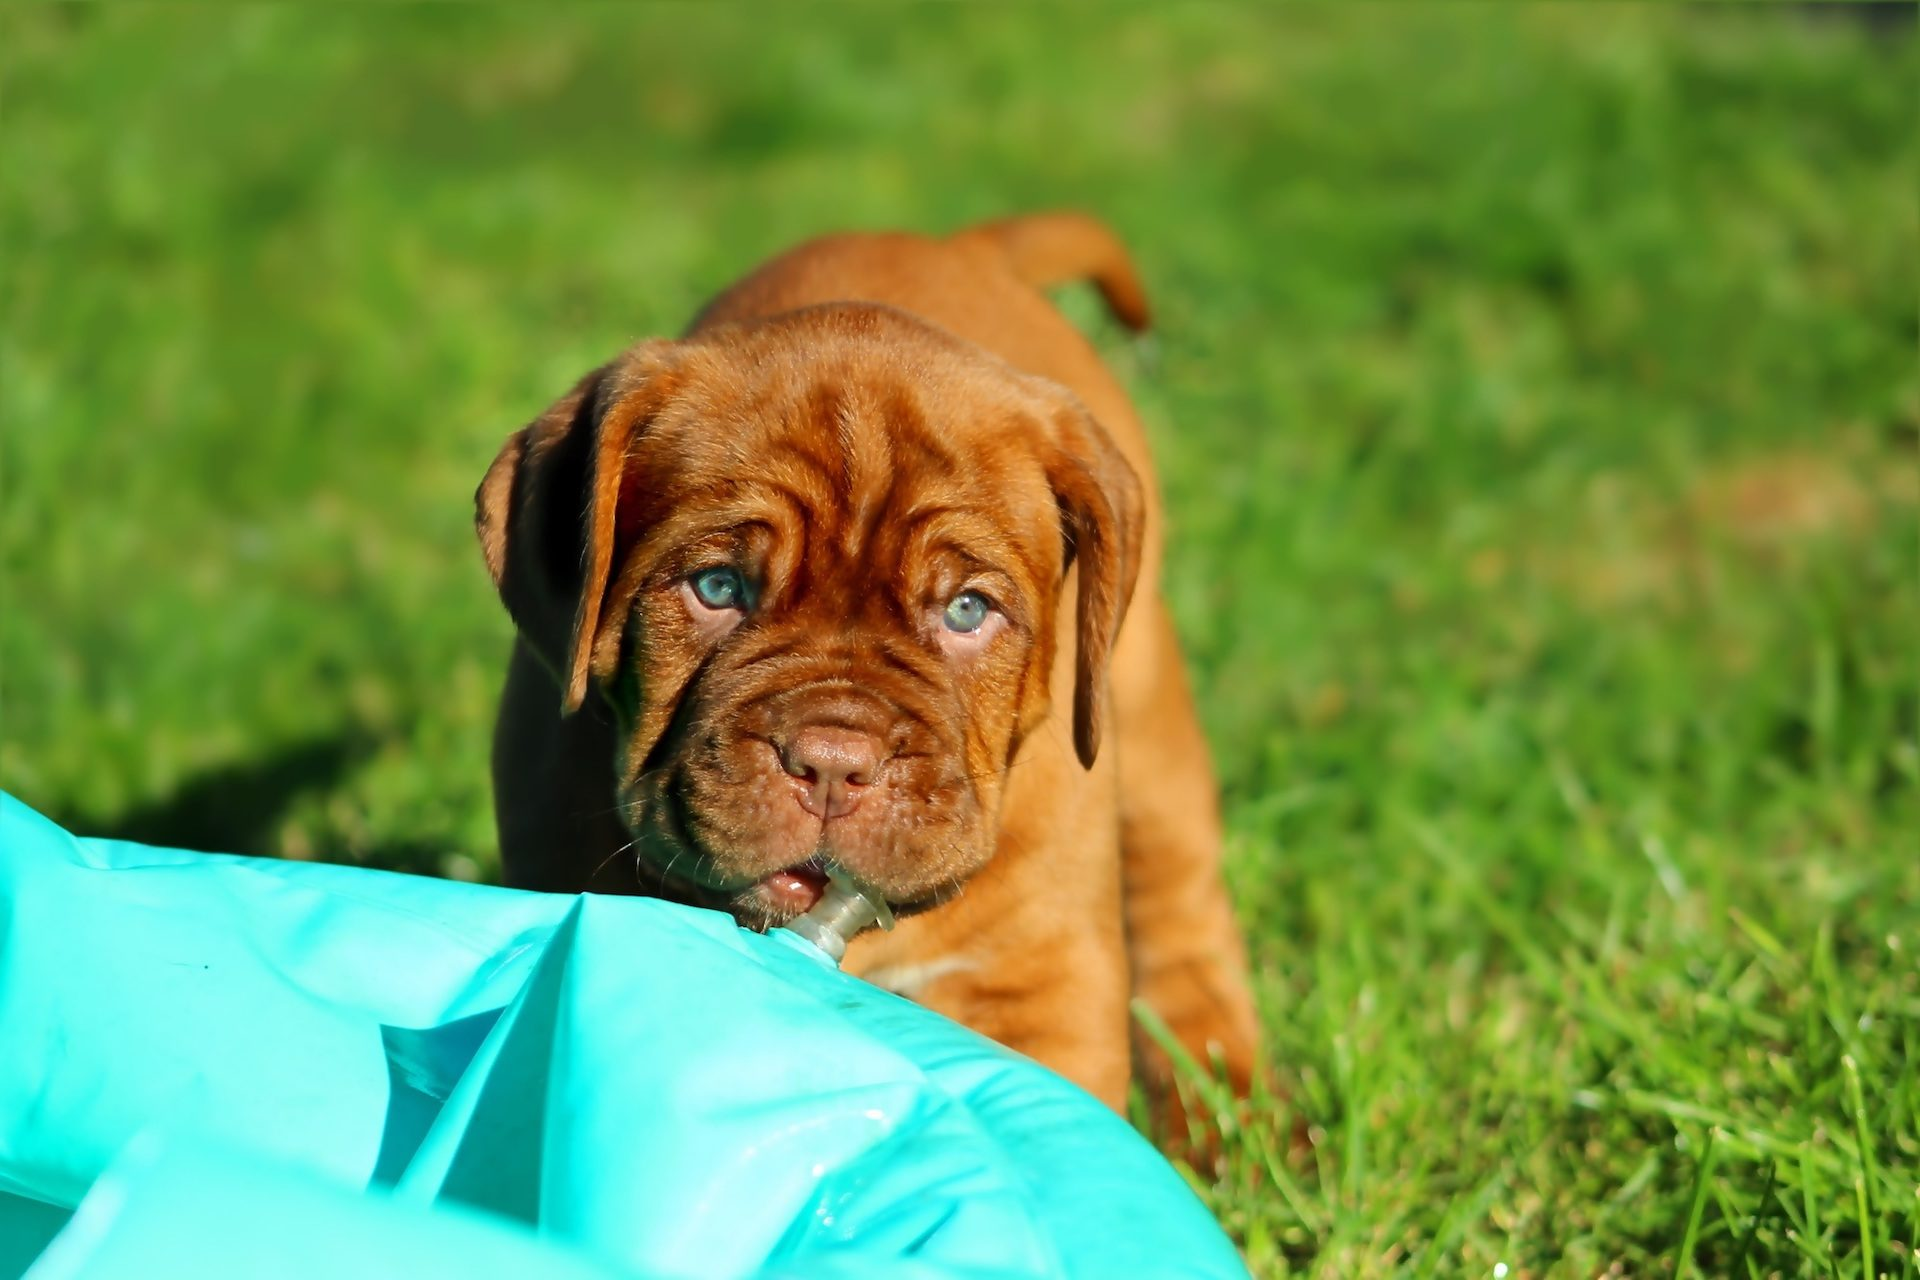 perro, cachorro, dogo, burdeos, mascota, jardín - Fondos de Pantalla HD - professor-falken.com